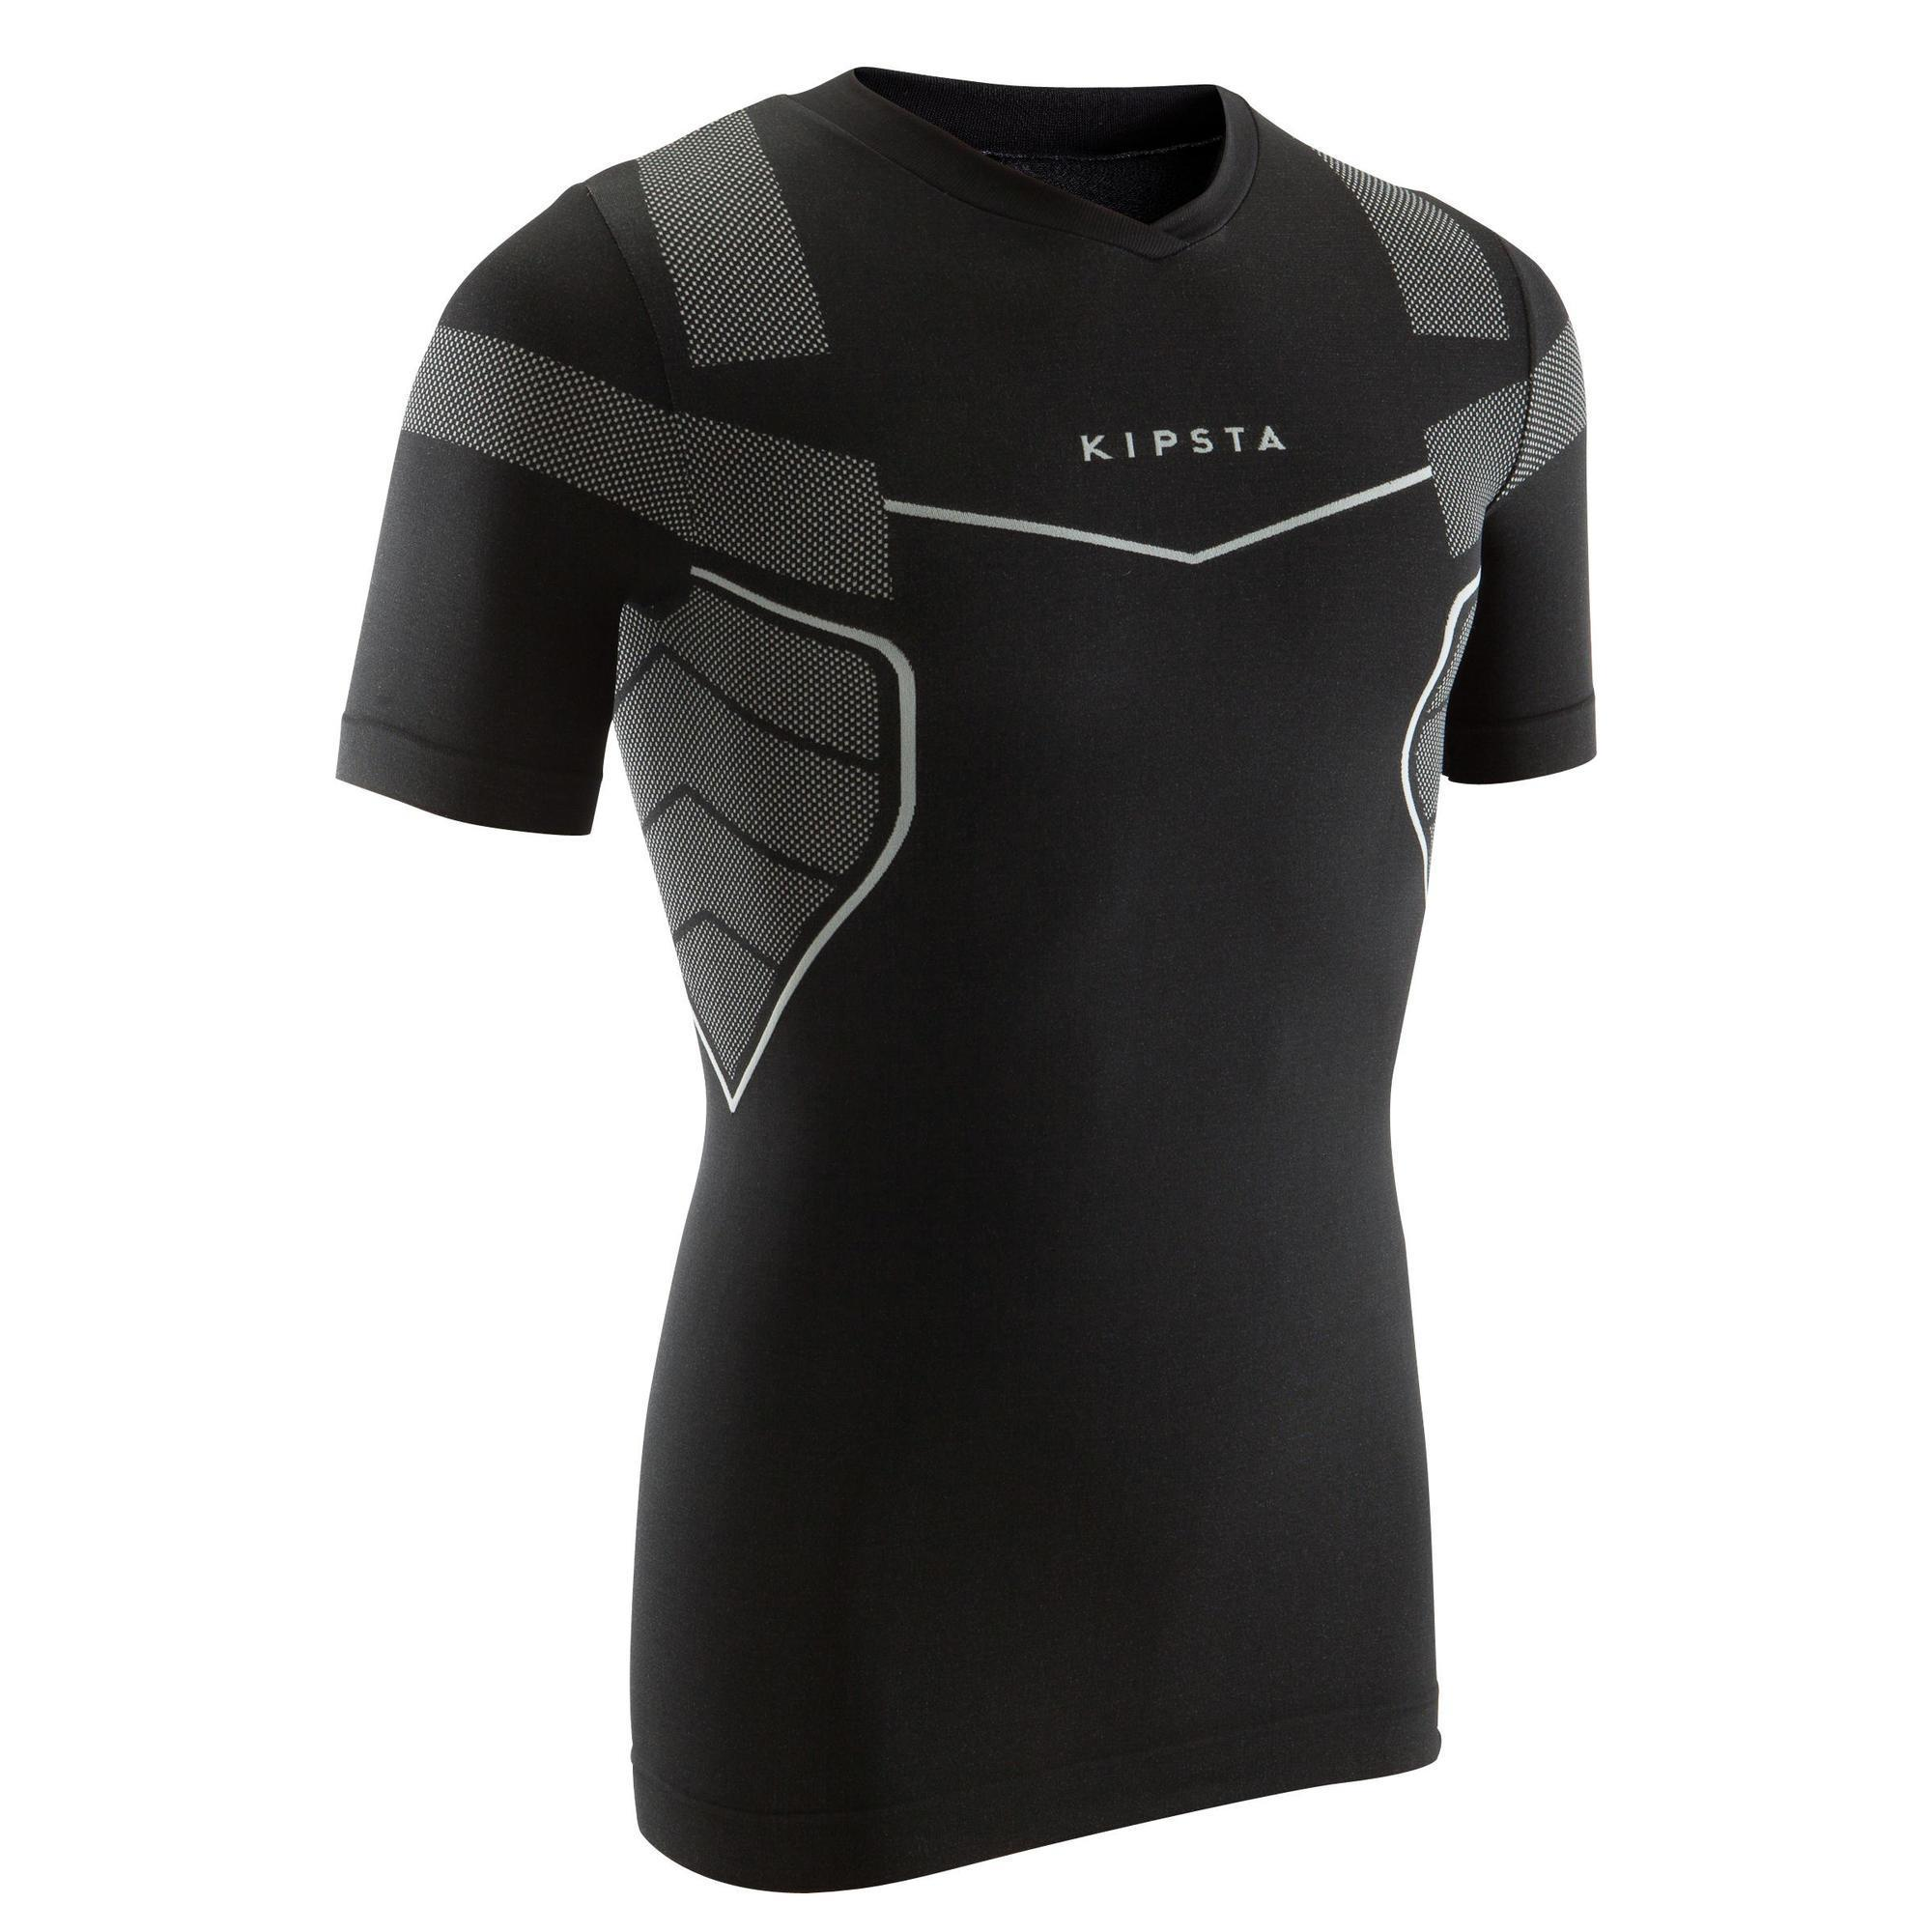 Funktionsshirt Keepdry 500 atmungsaktiv Erwachsene schwarz | Bekleidung > Shirts > Funktionsshirts | Kipsta